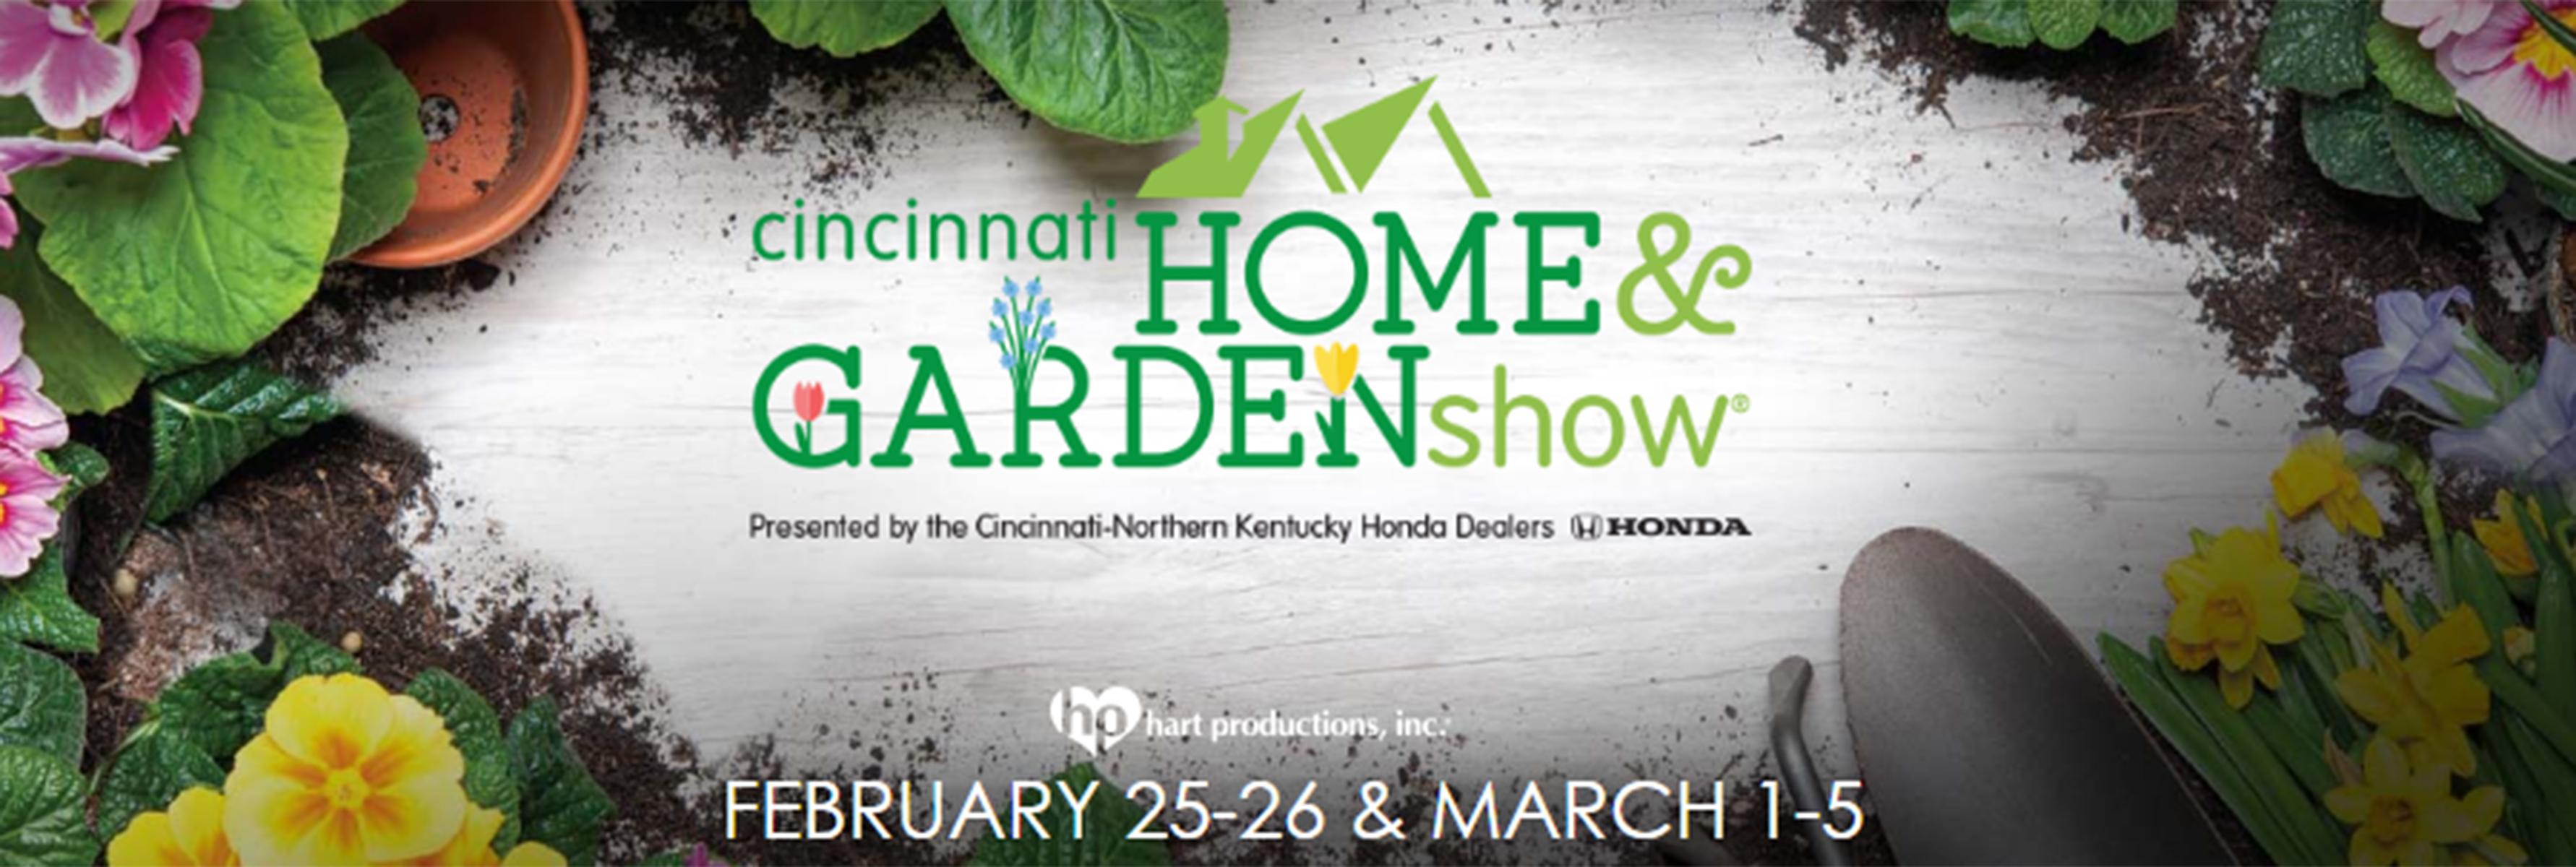 Pianos And Petals Cincinnati Home And Garden Show Willis Music